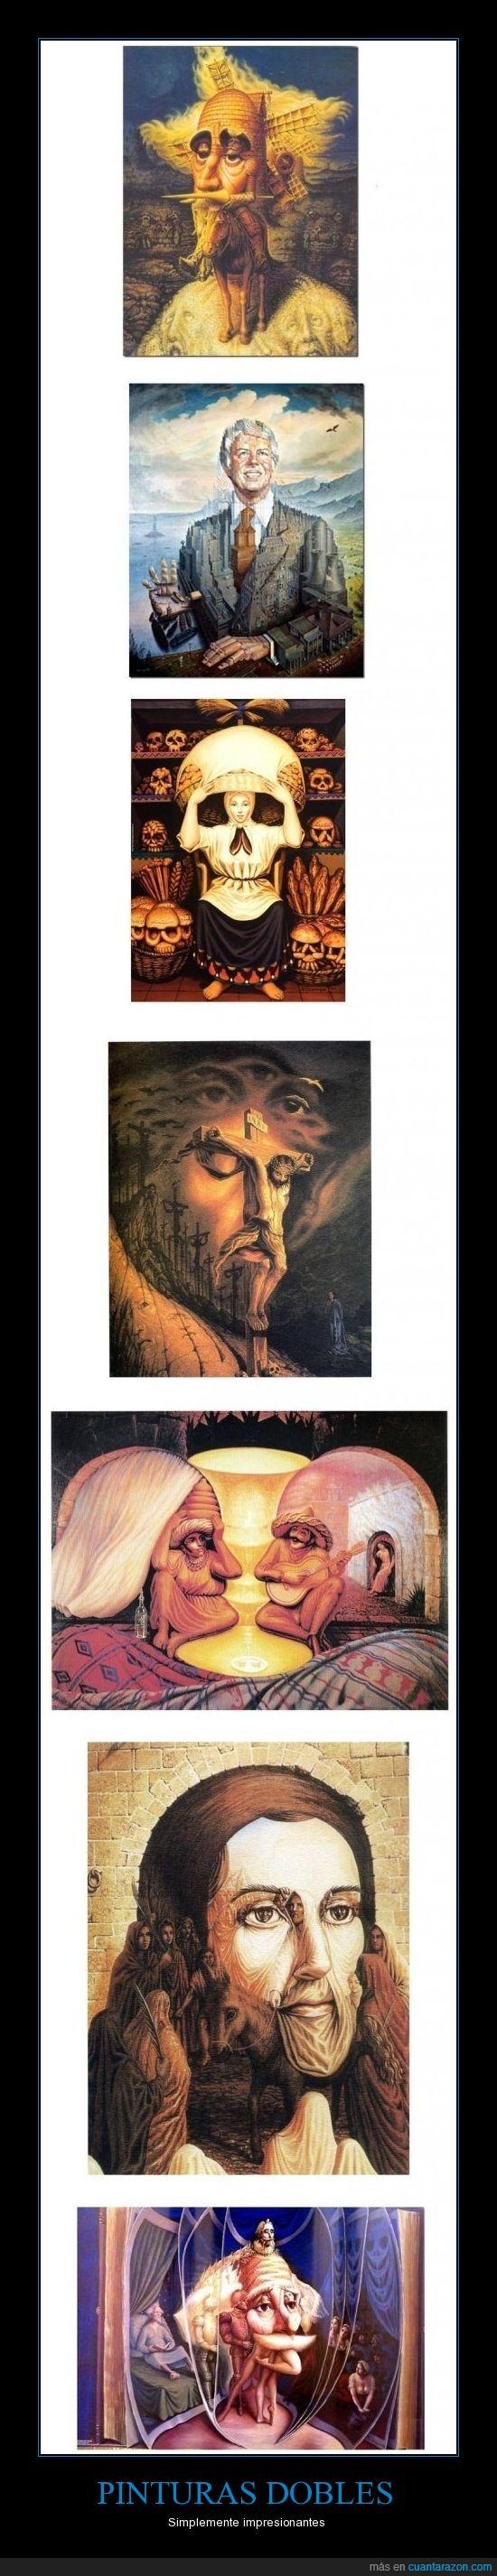 arte,calavera,cuadros,Don Quijote,edificios,Jesucristo,mexicanos,mola,pinturas dobles,viejetes